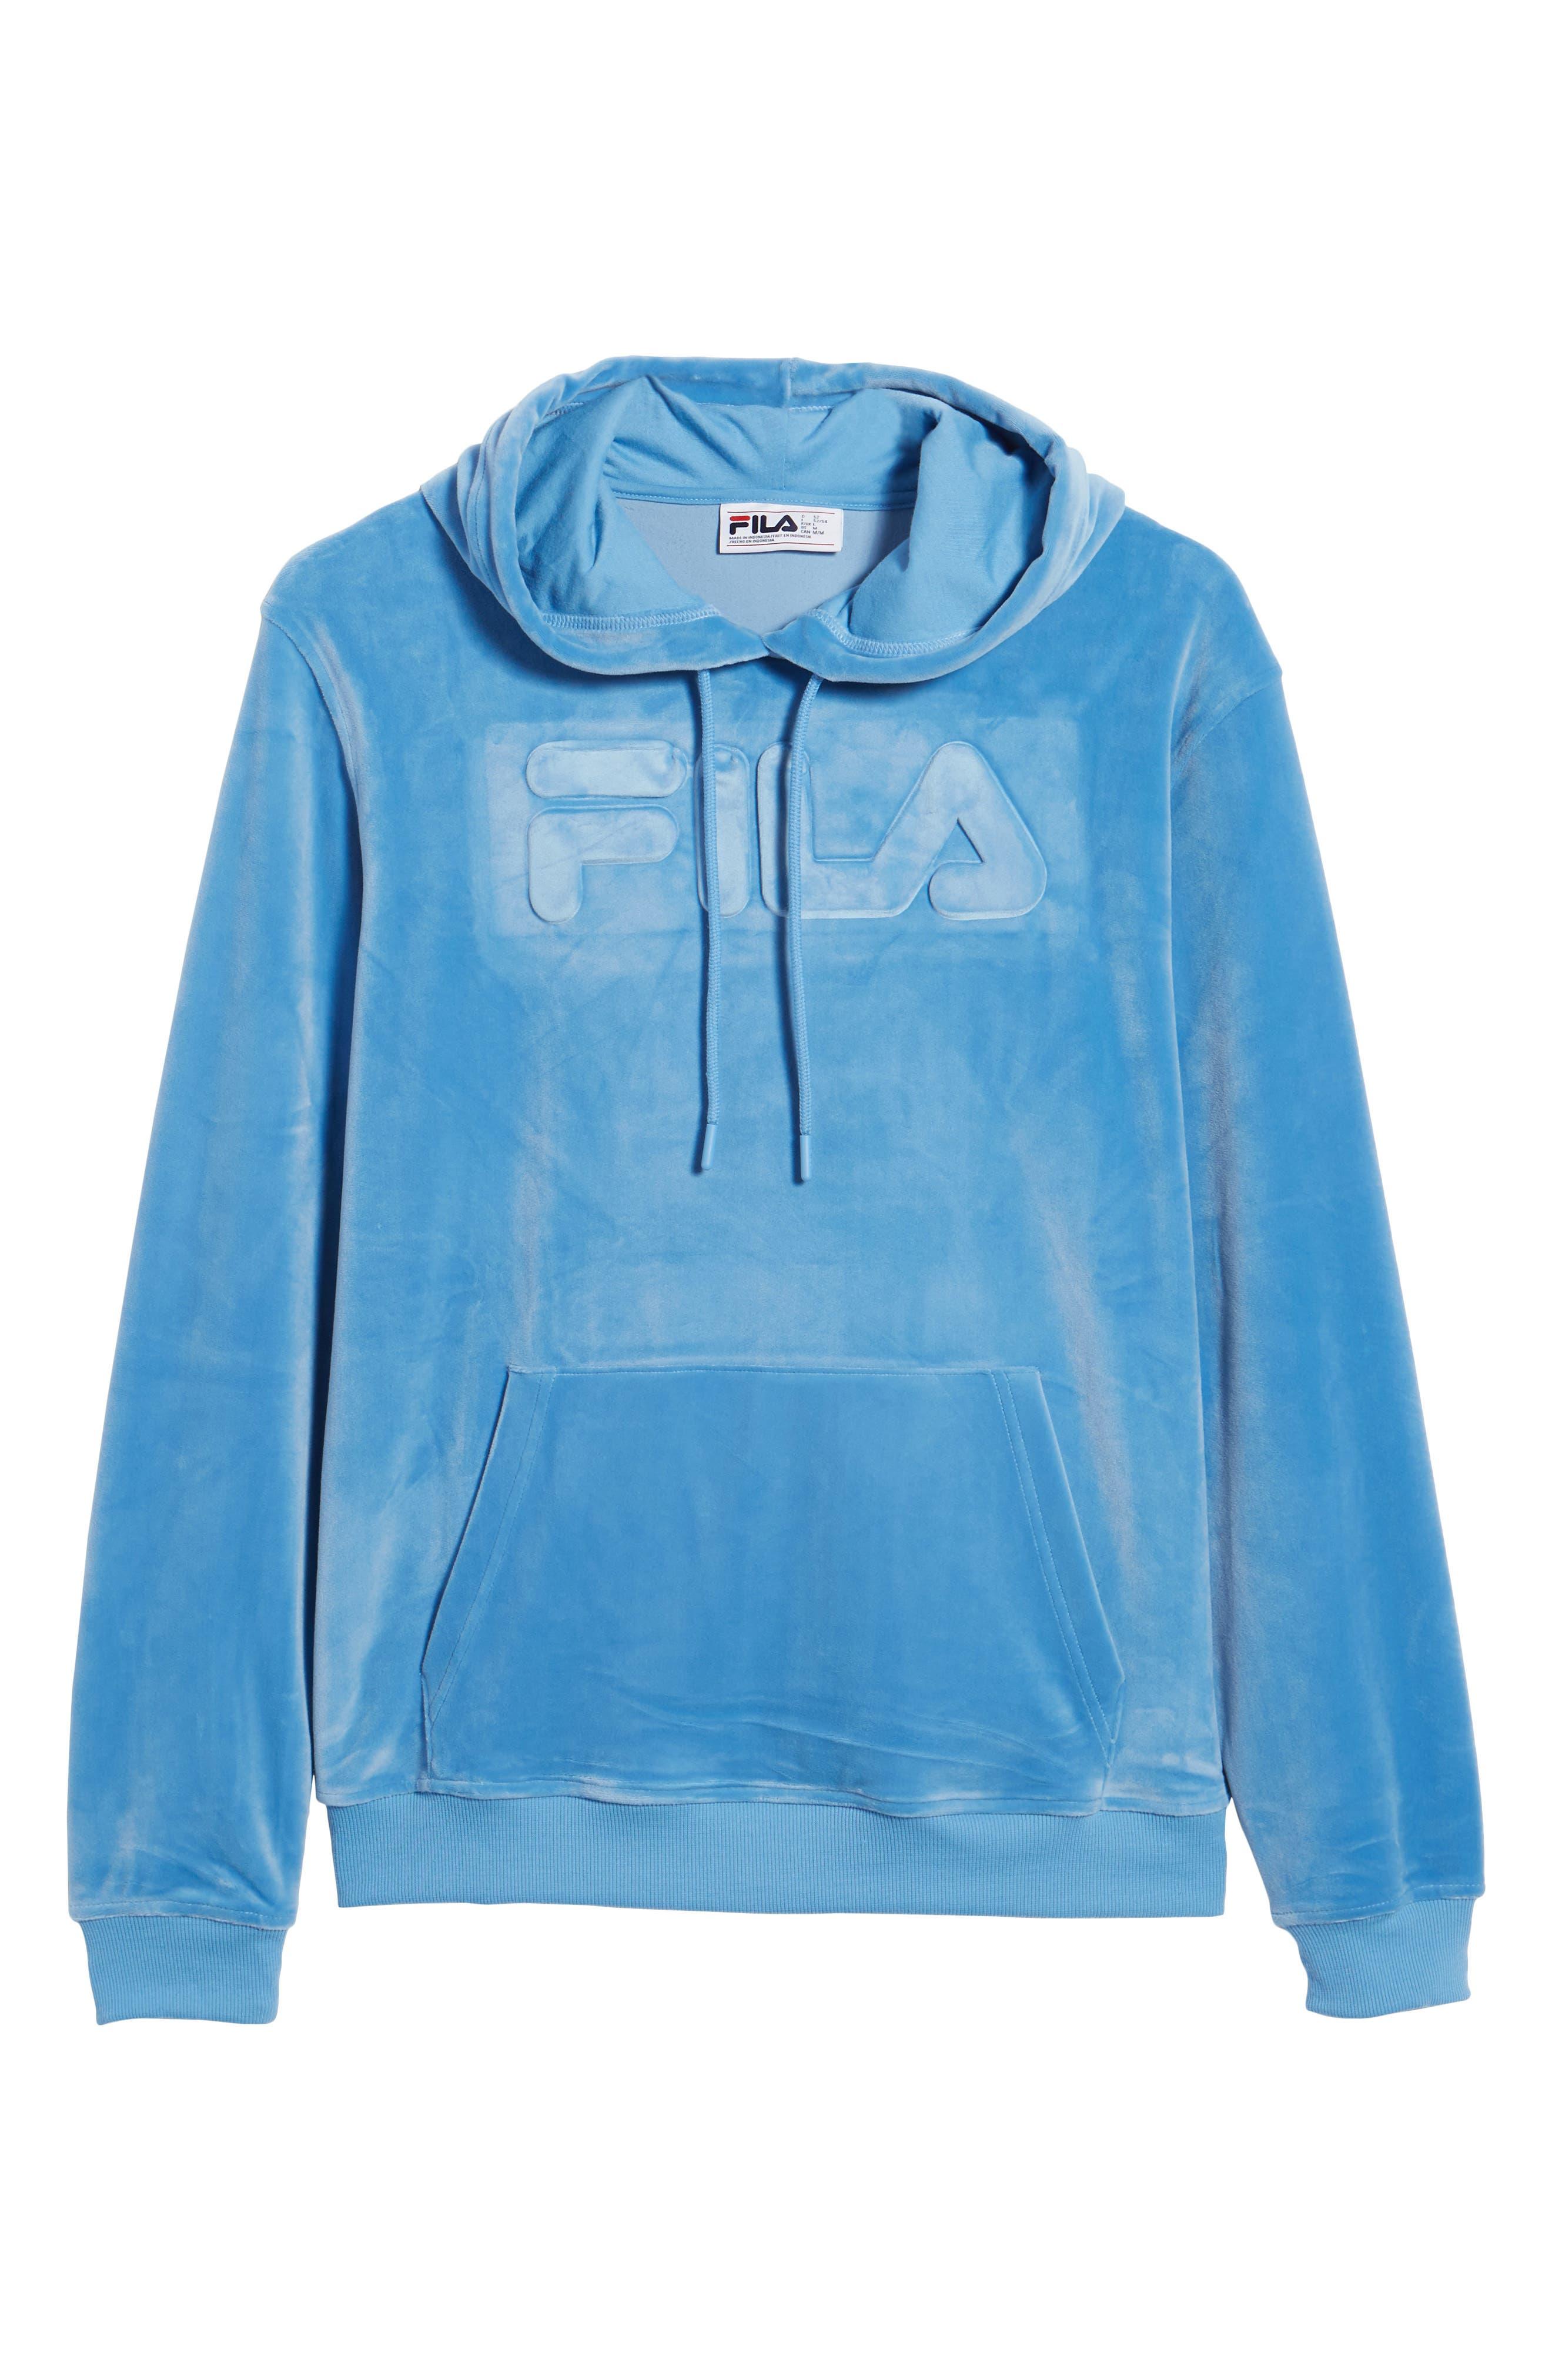 Asher Velour Hoodie Sweatshirt,                             Alternate thumbnail 6, color,                             Silver Lake Blue